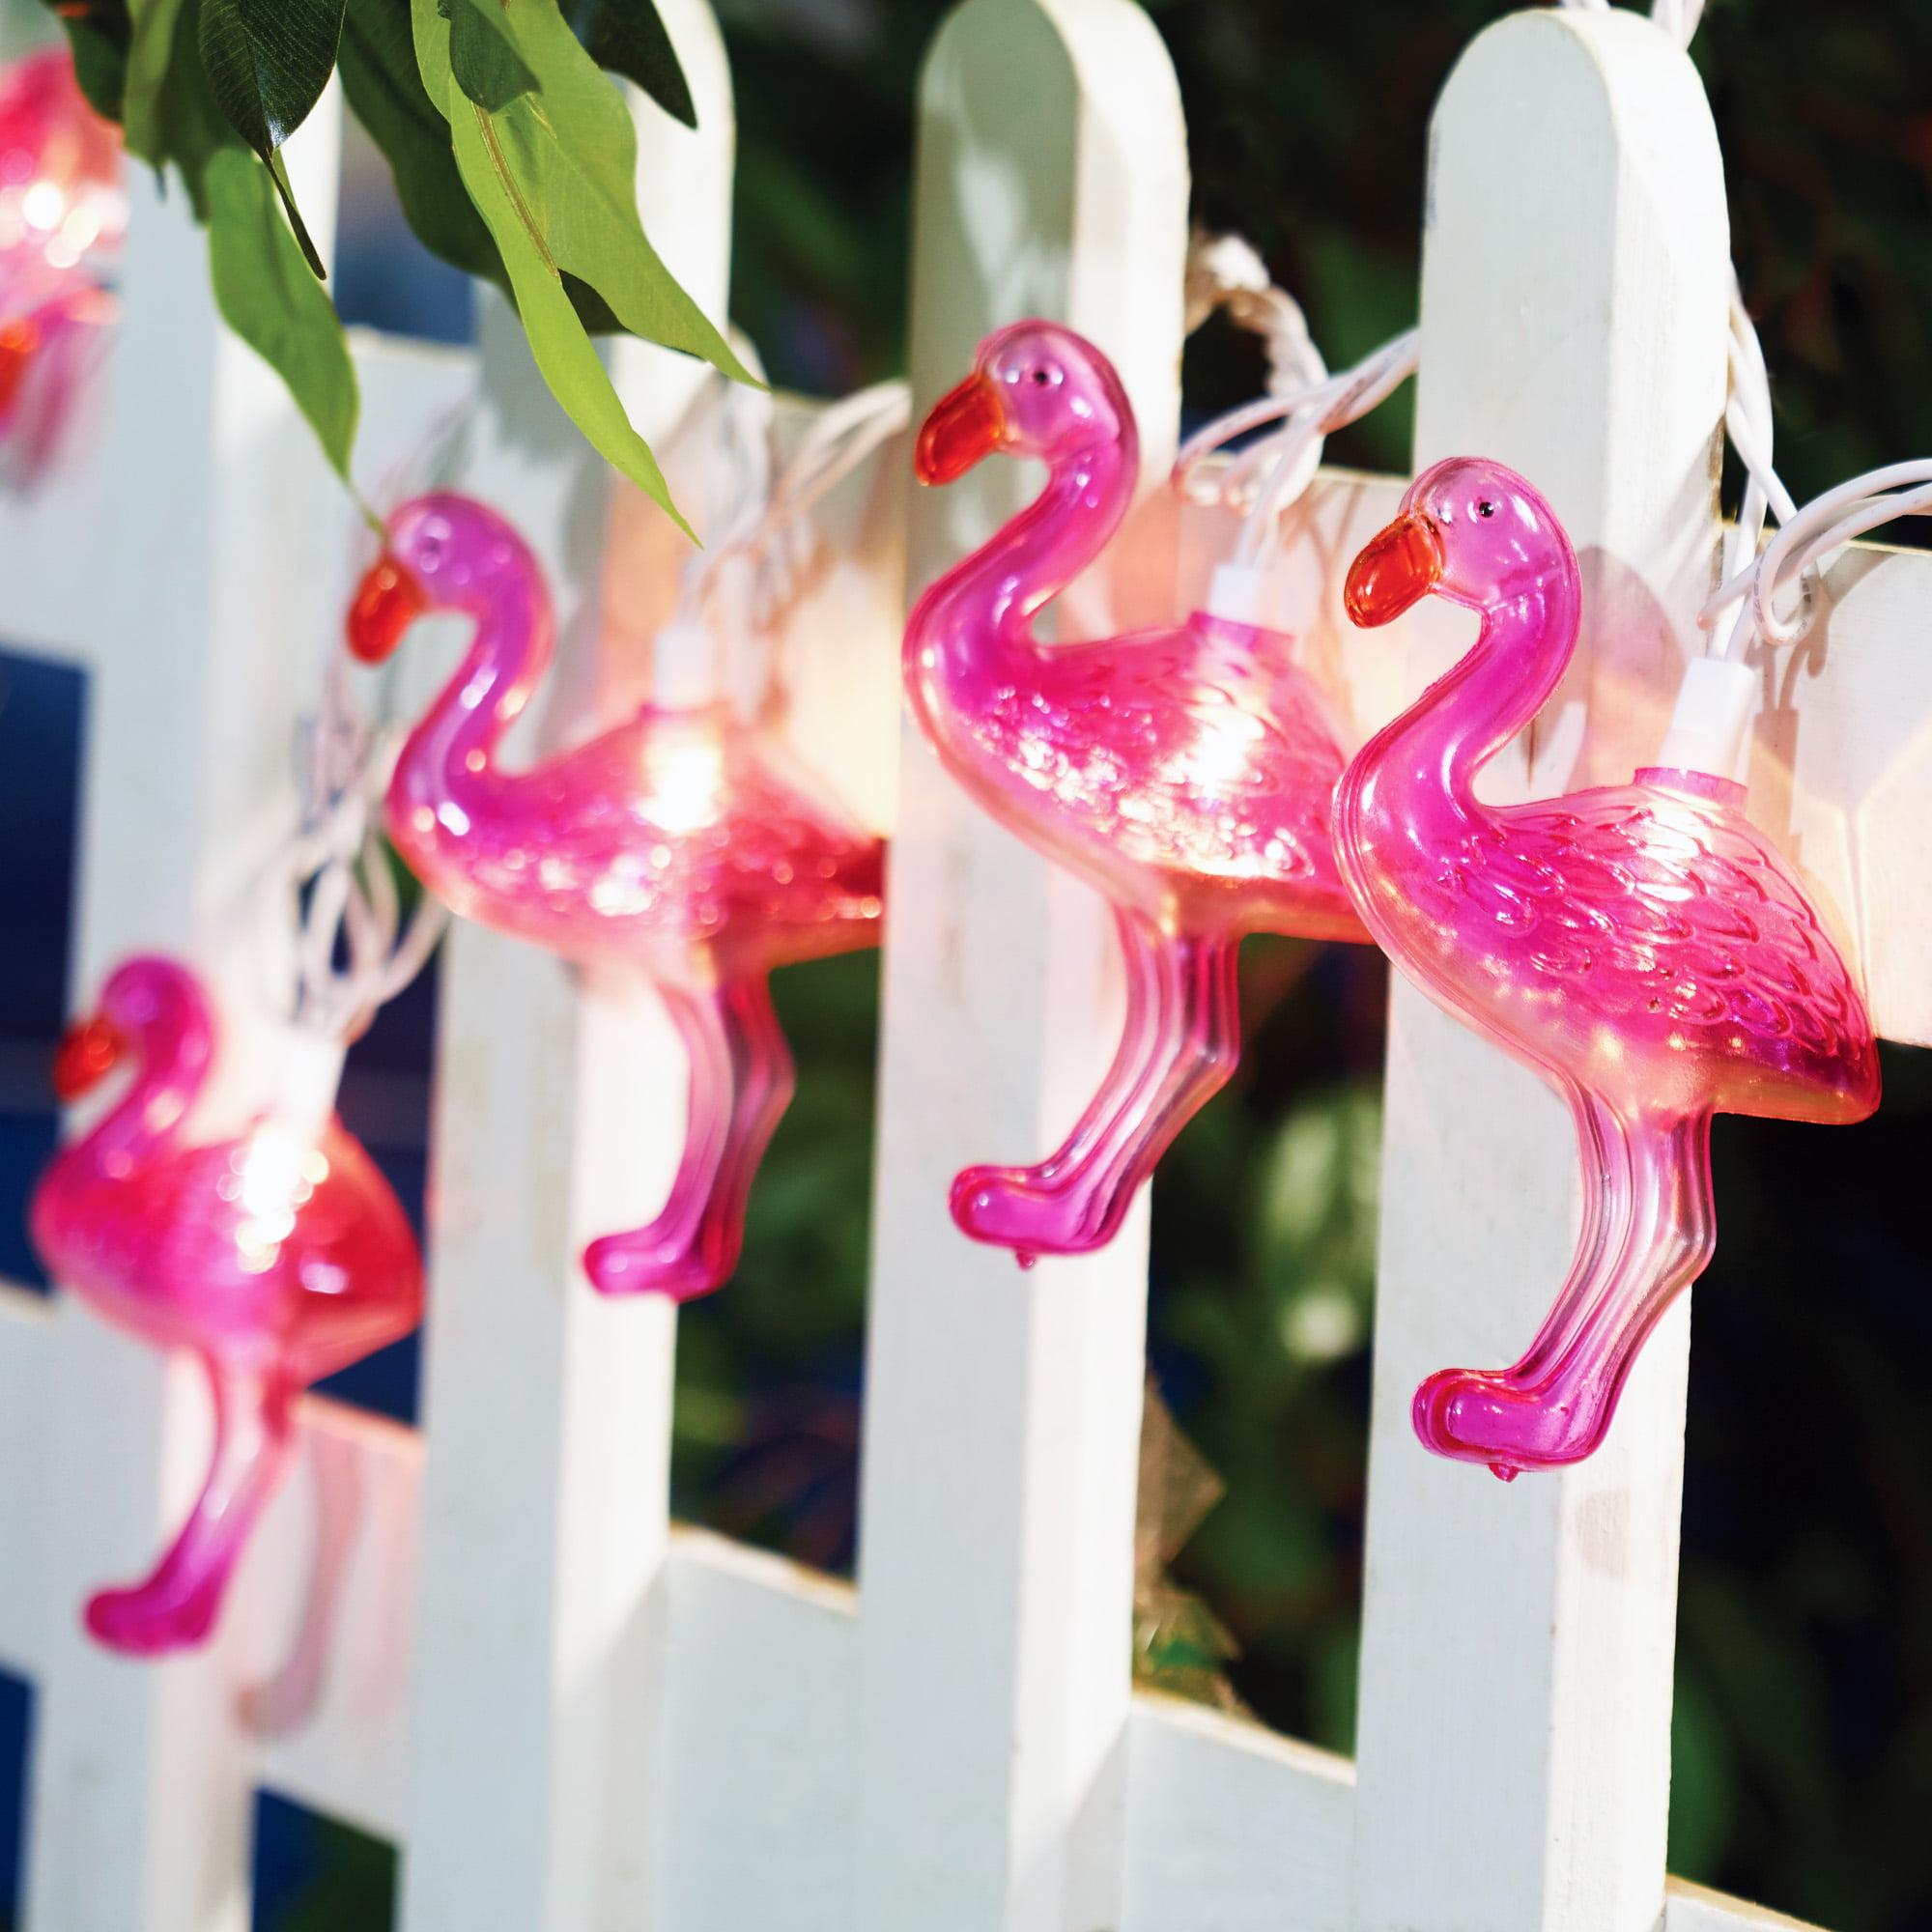 Mainstays 20 (10x2) Ul Flamingo String Lights